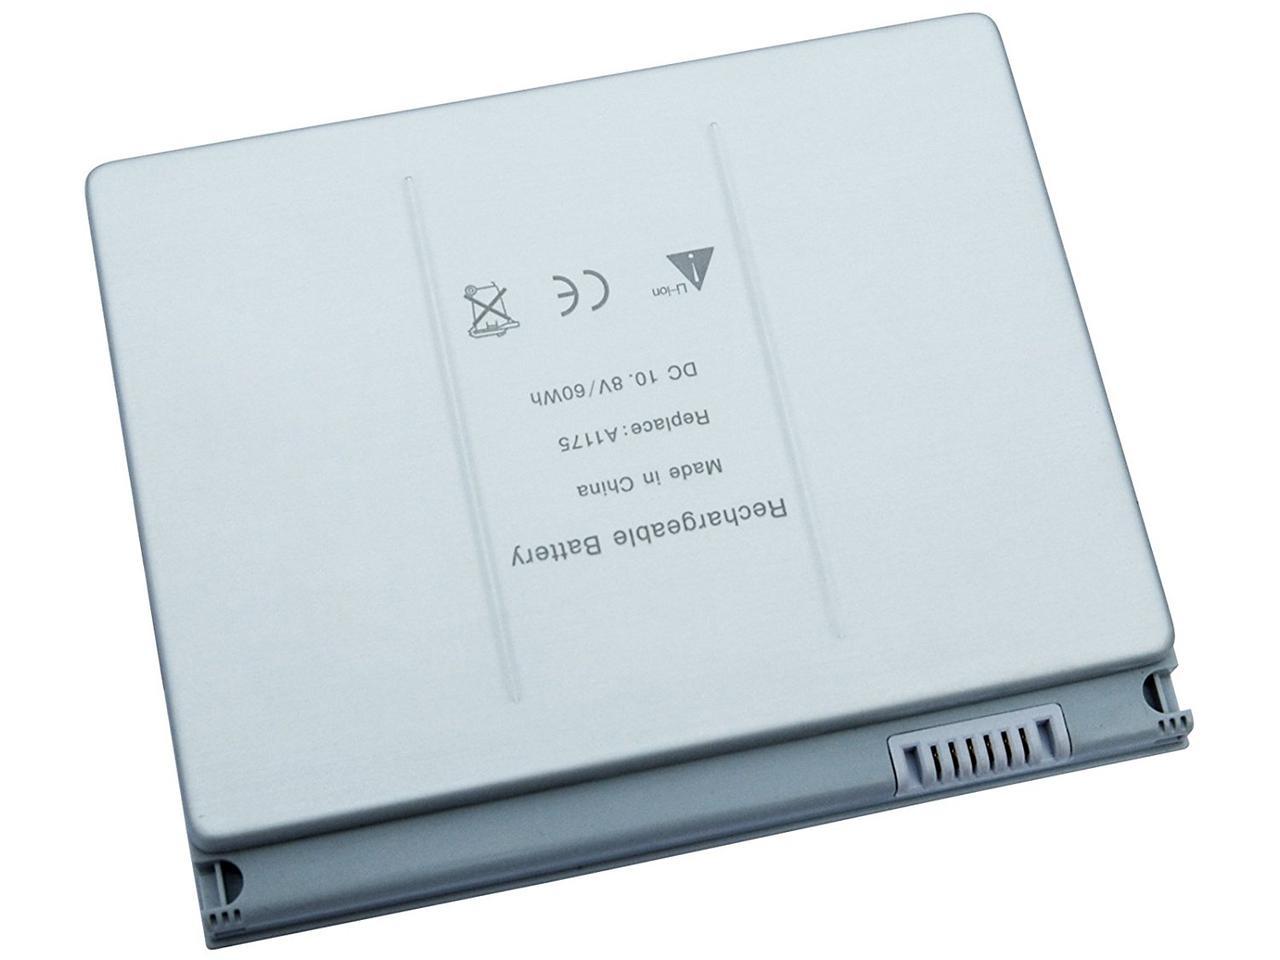 Батарея Apple A1175, A1150 10.8V 60Wh Silver (Металлический  корпус).